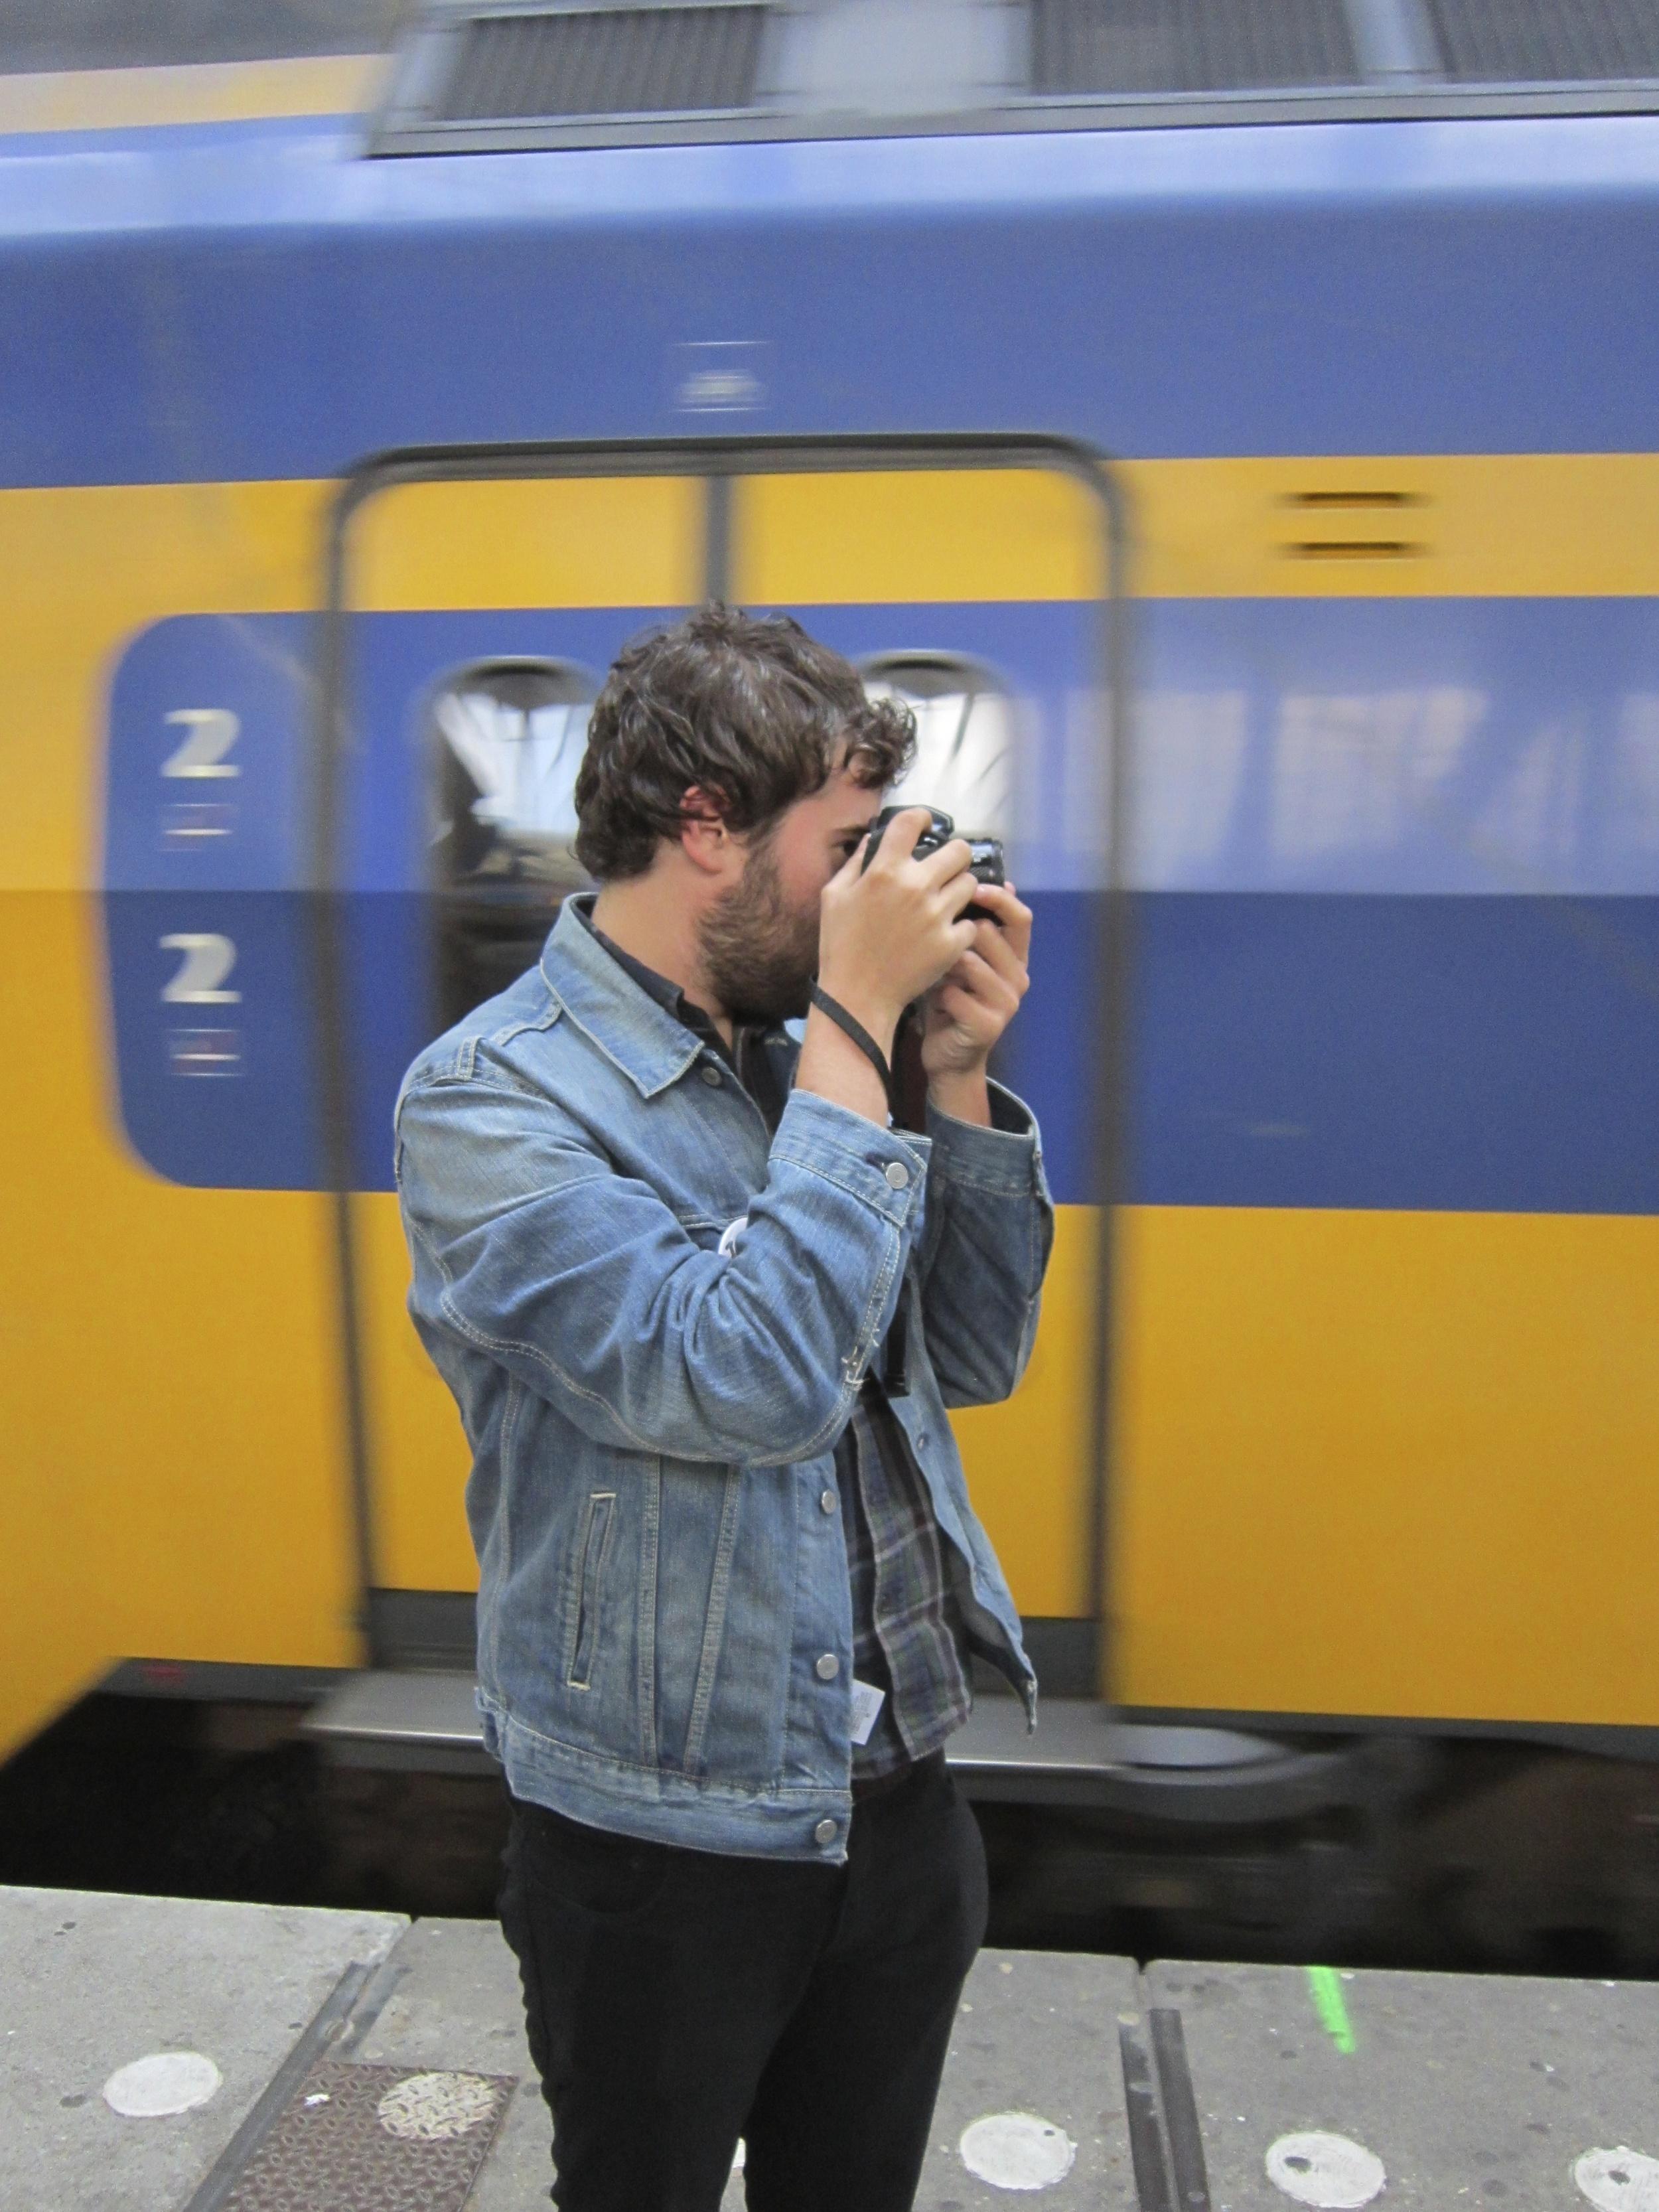 Liège Train Station - Liège, Belgium